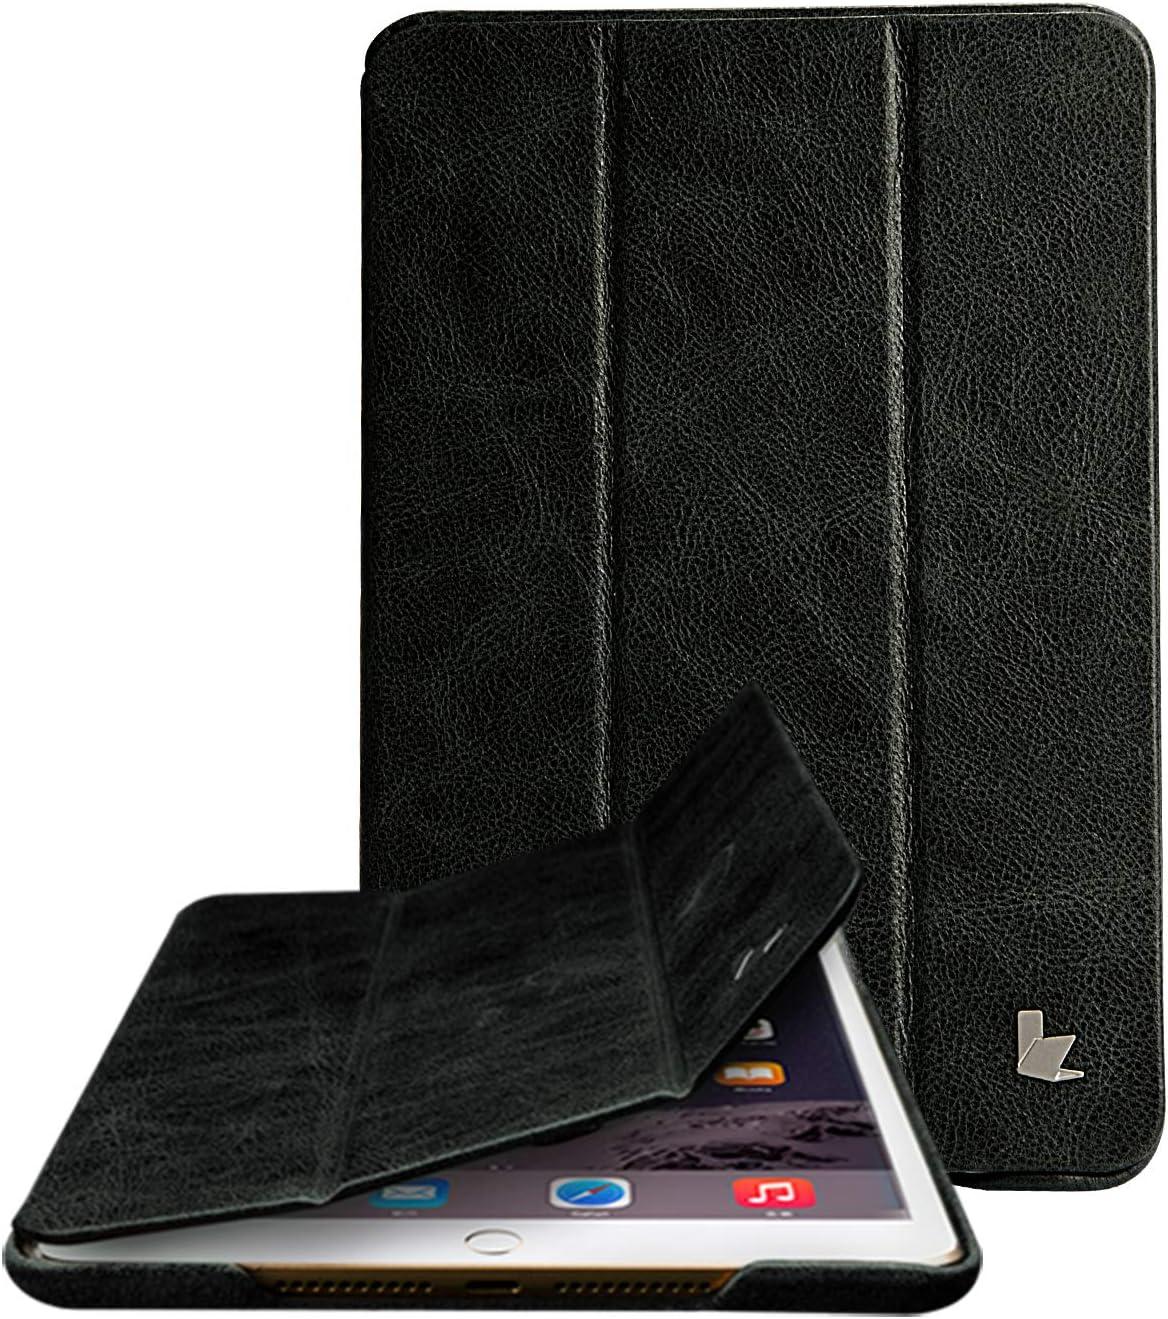 Jisoncase iPad Mini 4 Case, Leather Ultra Slim Smart-Shell Stand Cover Case with Auto Wake/Sleep for Apple iPad Mini 4 in Ash Black